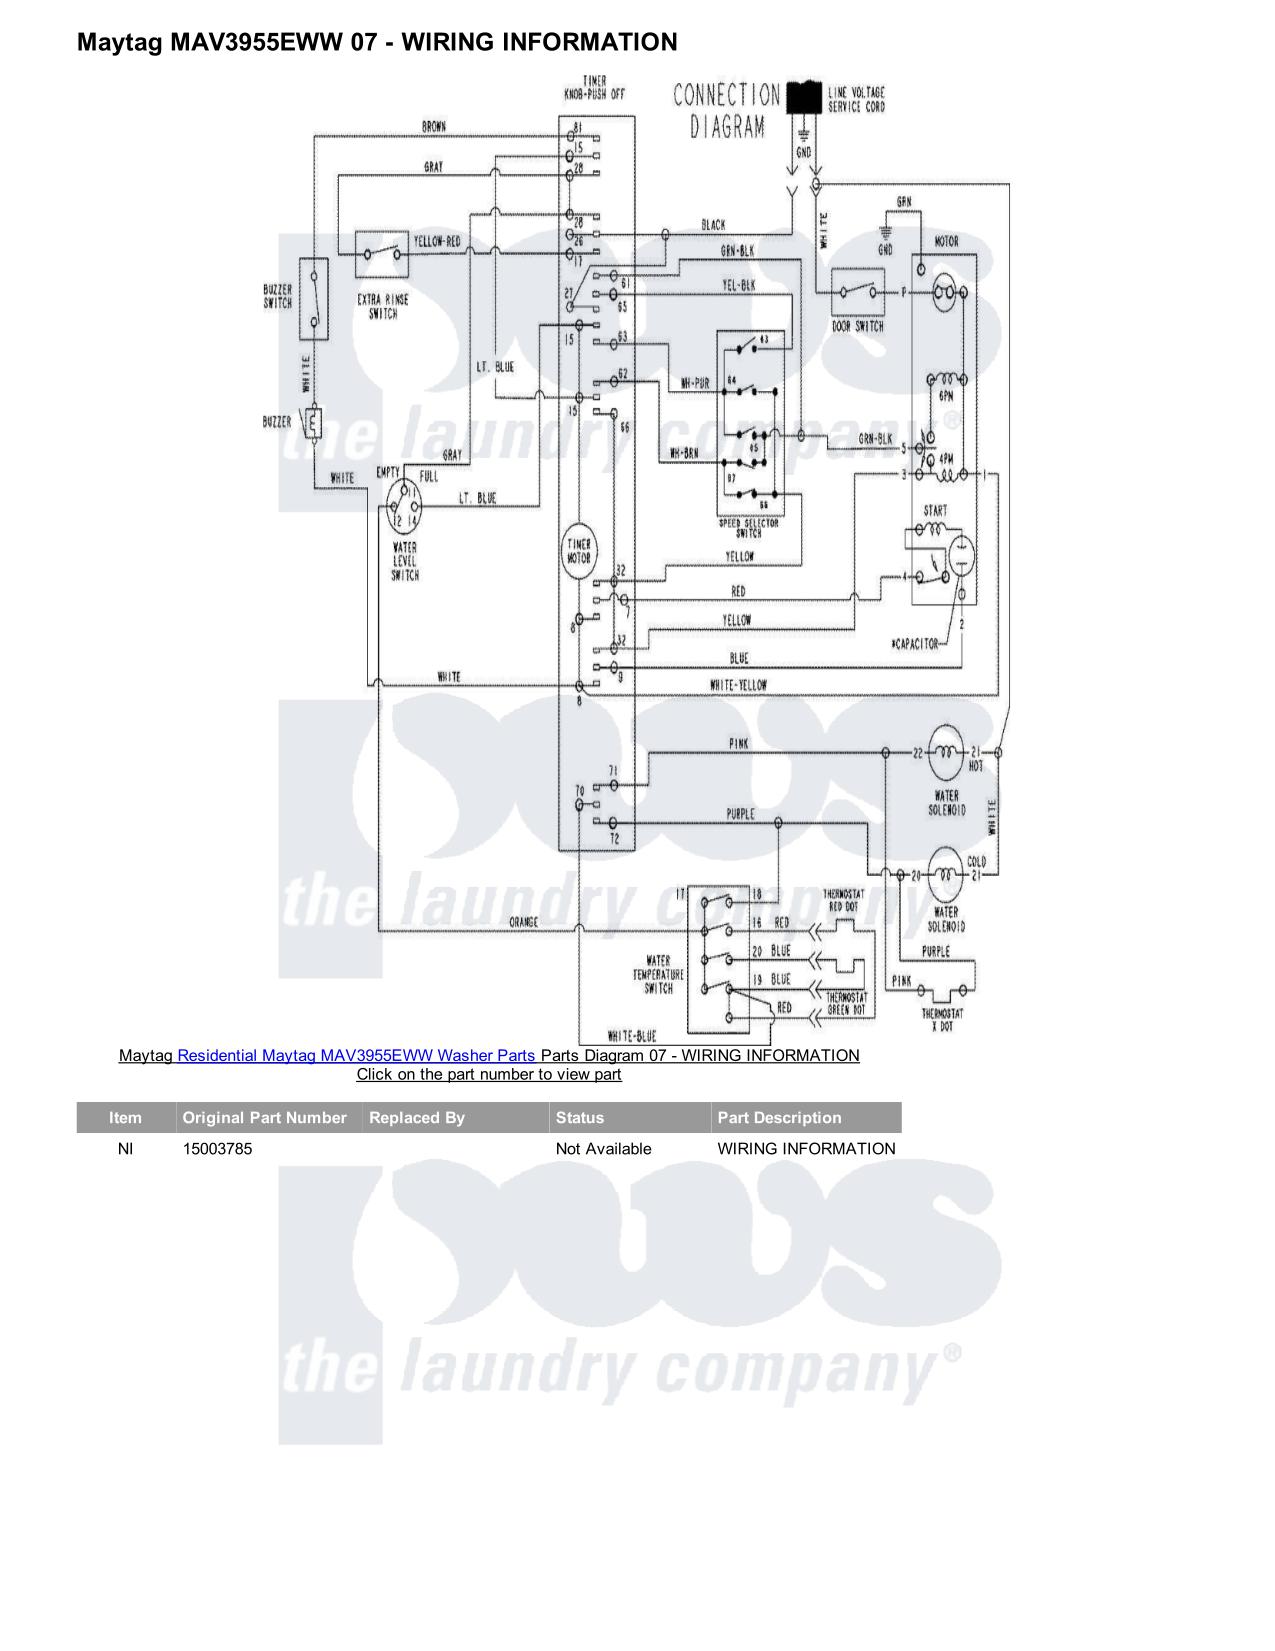 Maytag washer service manual Pdf on